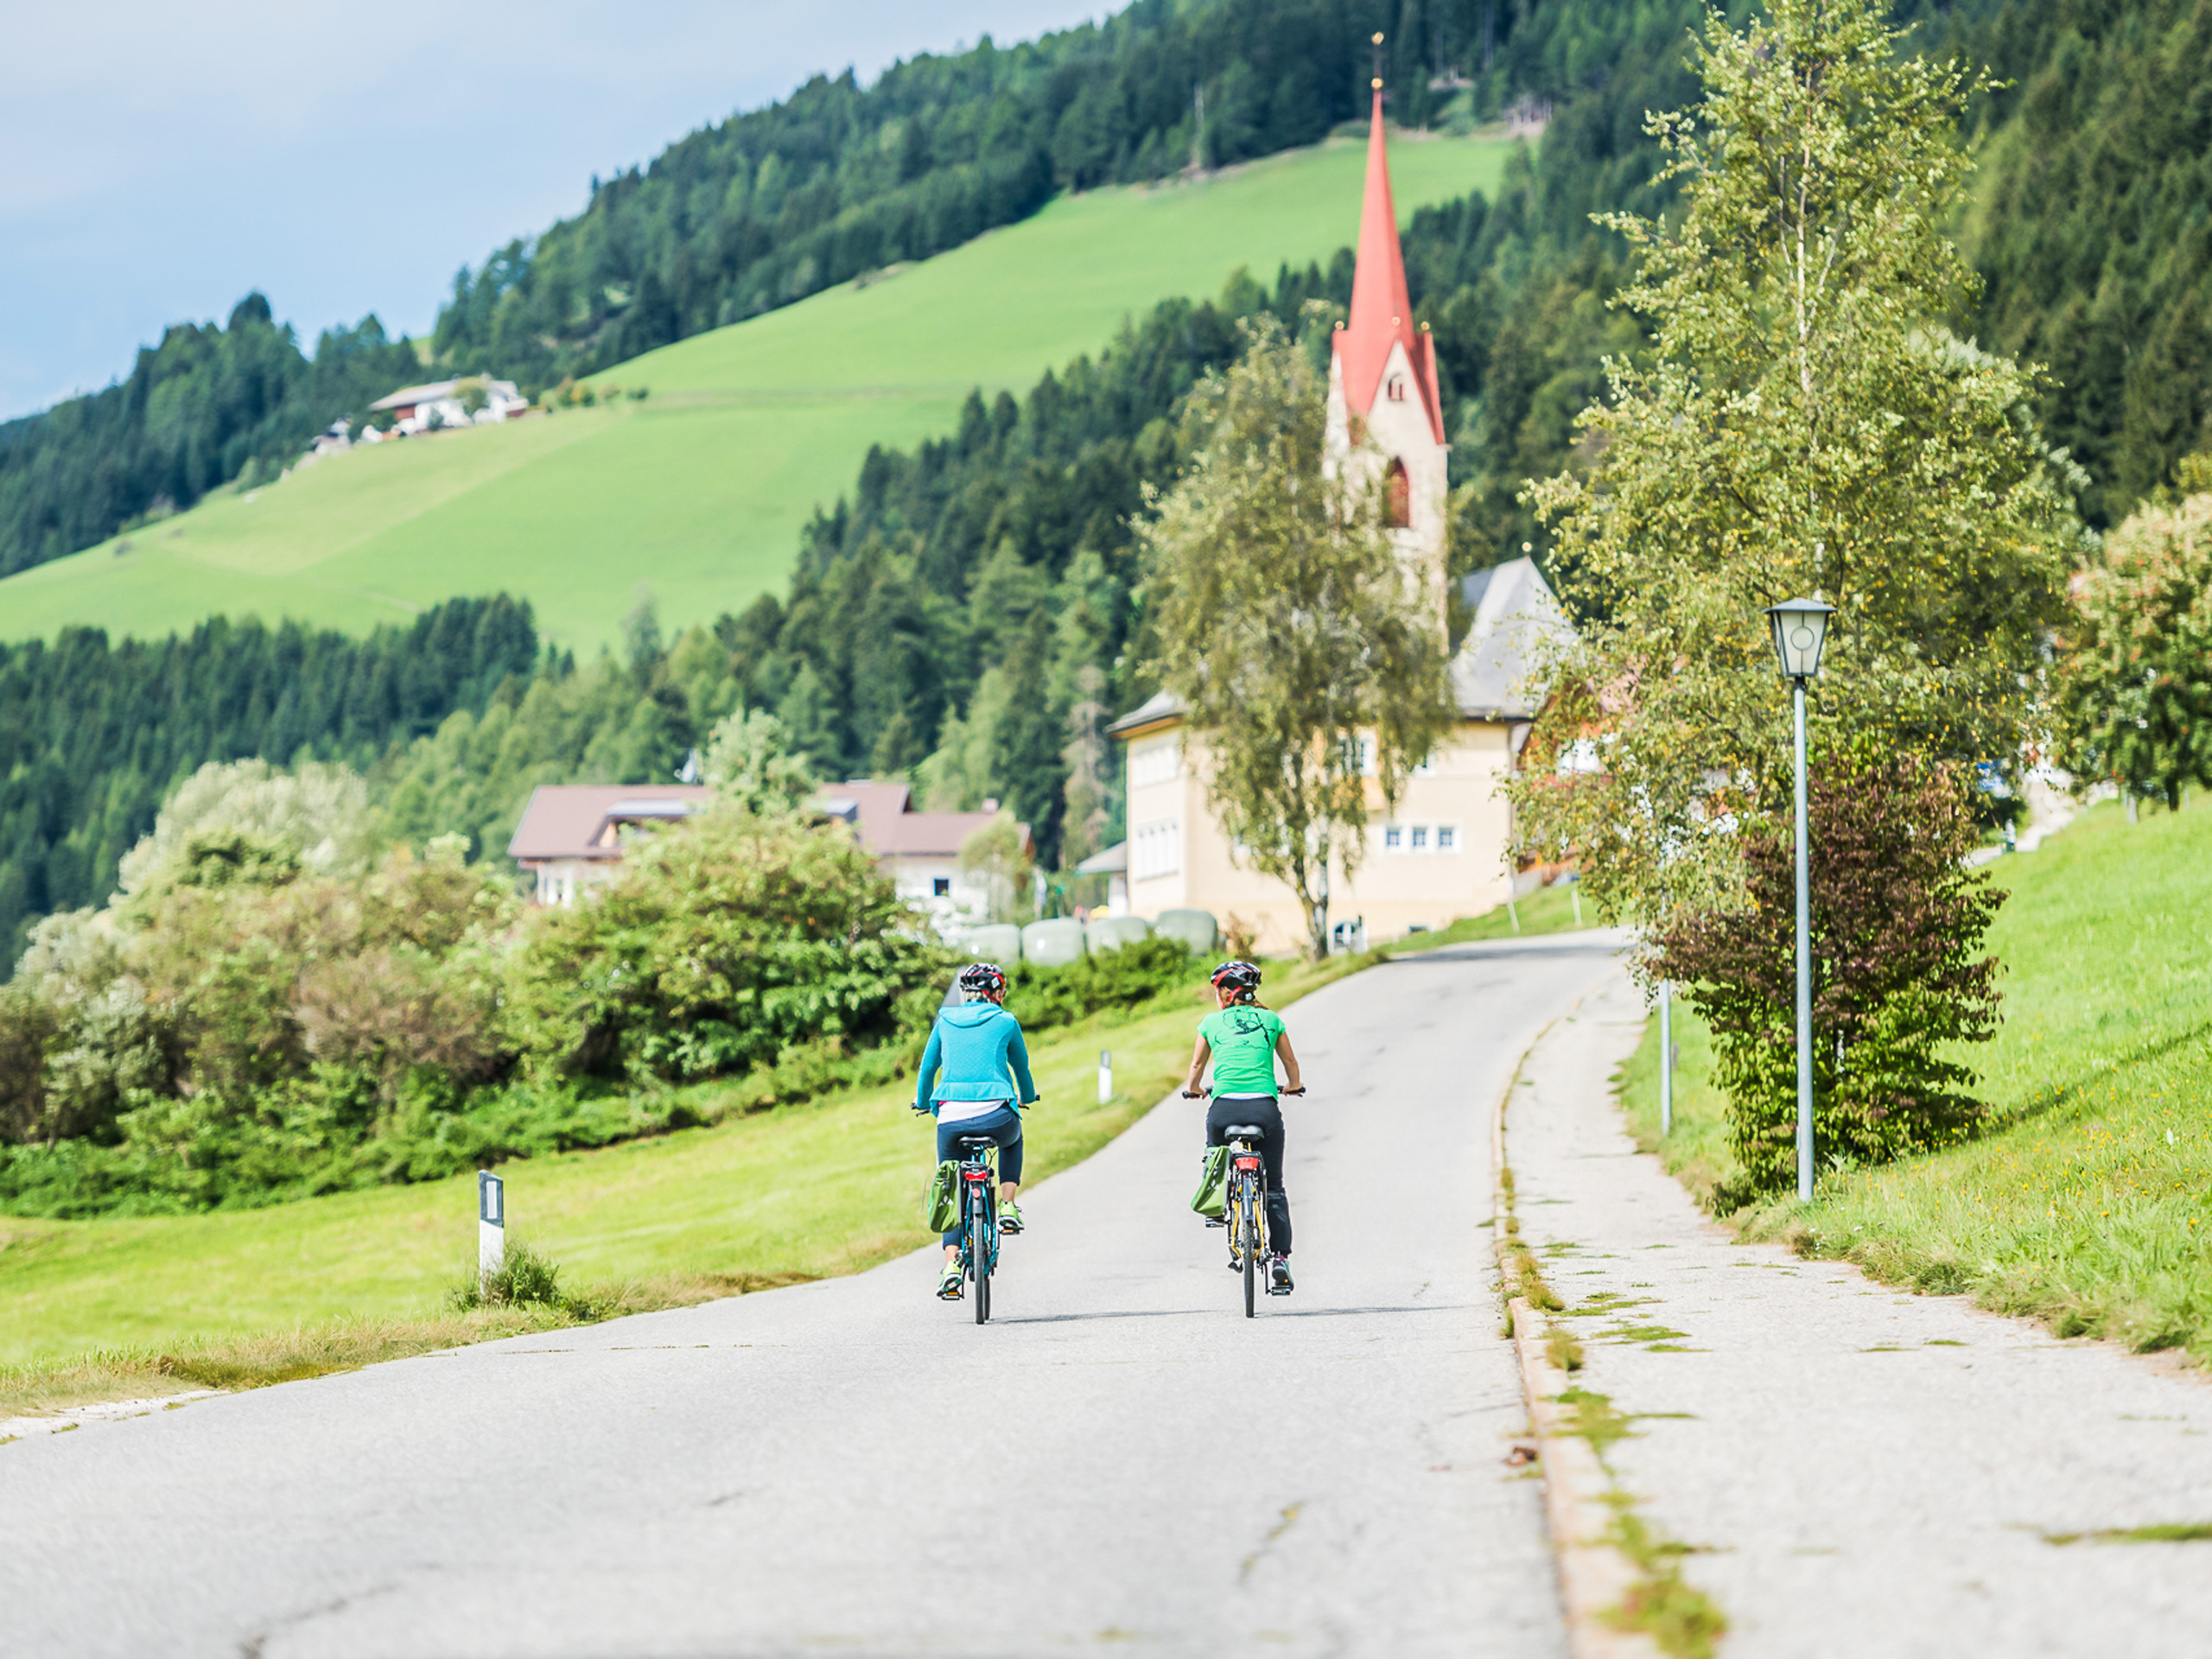 Biking on the Italy road